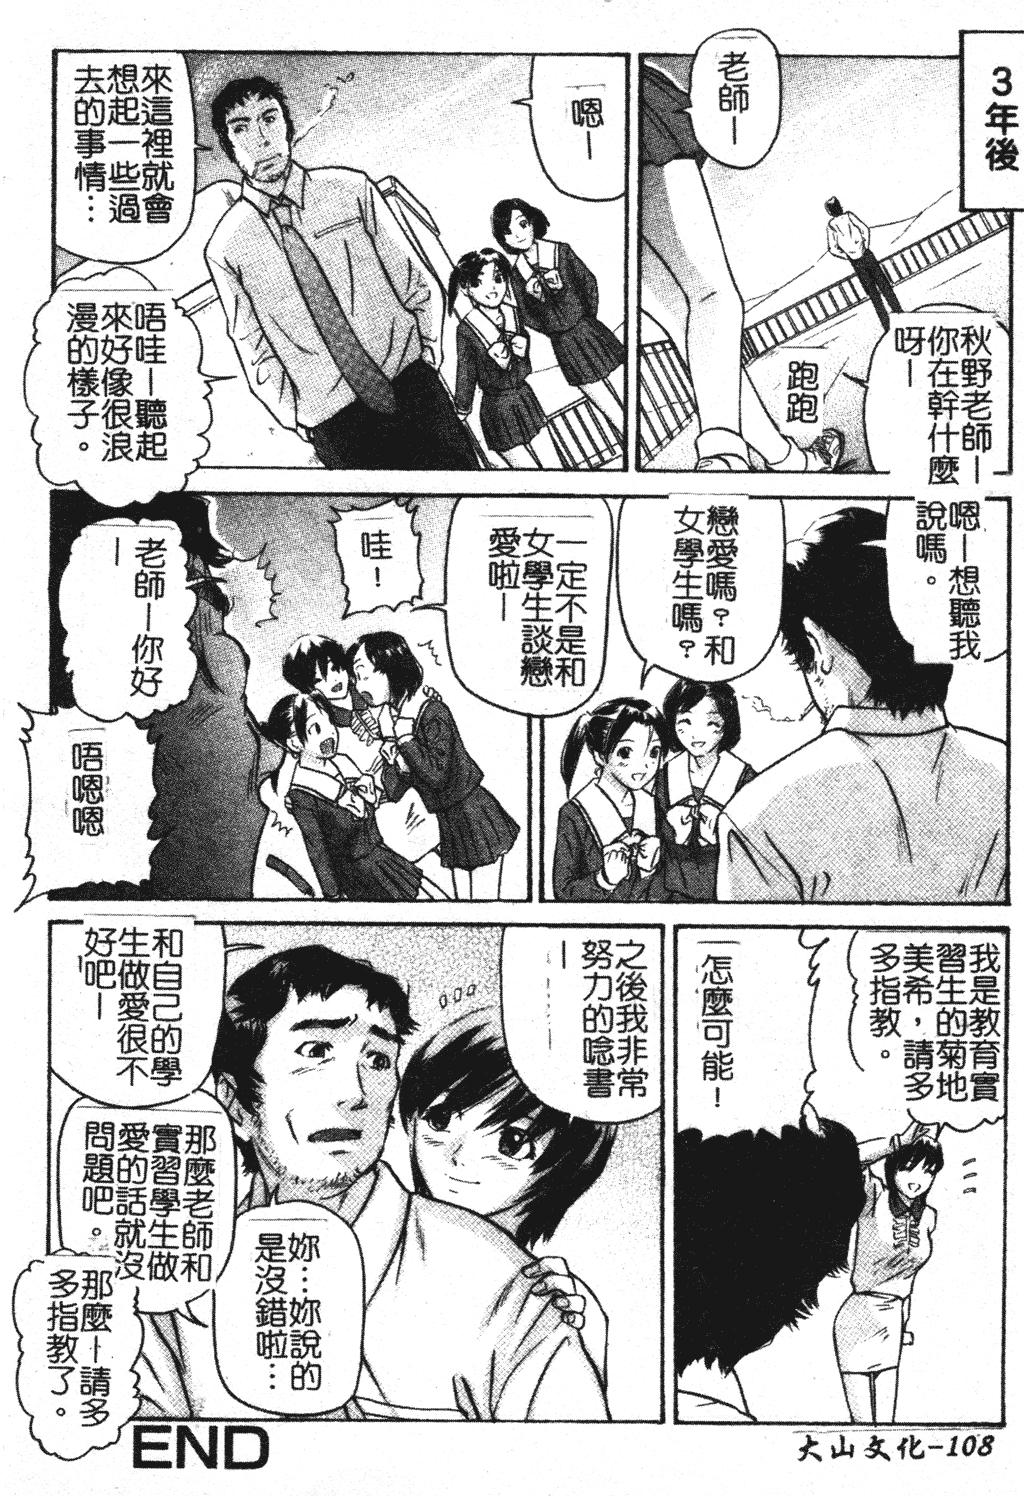 Ikenai Asobi 108